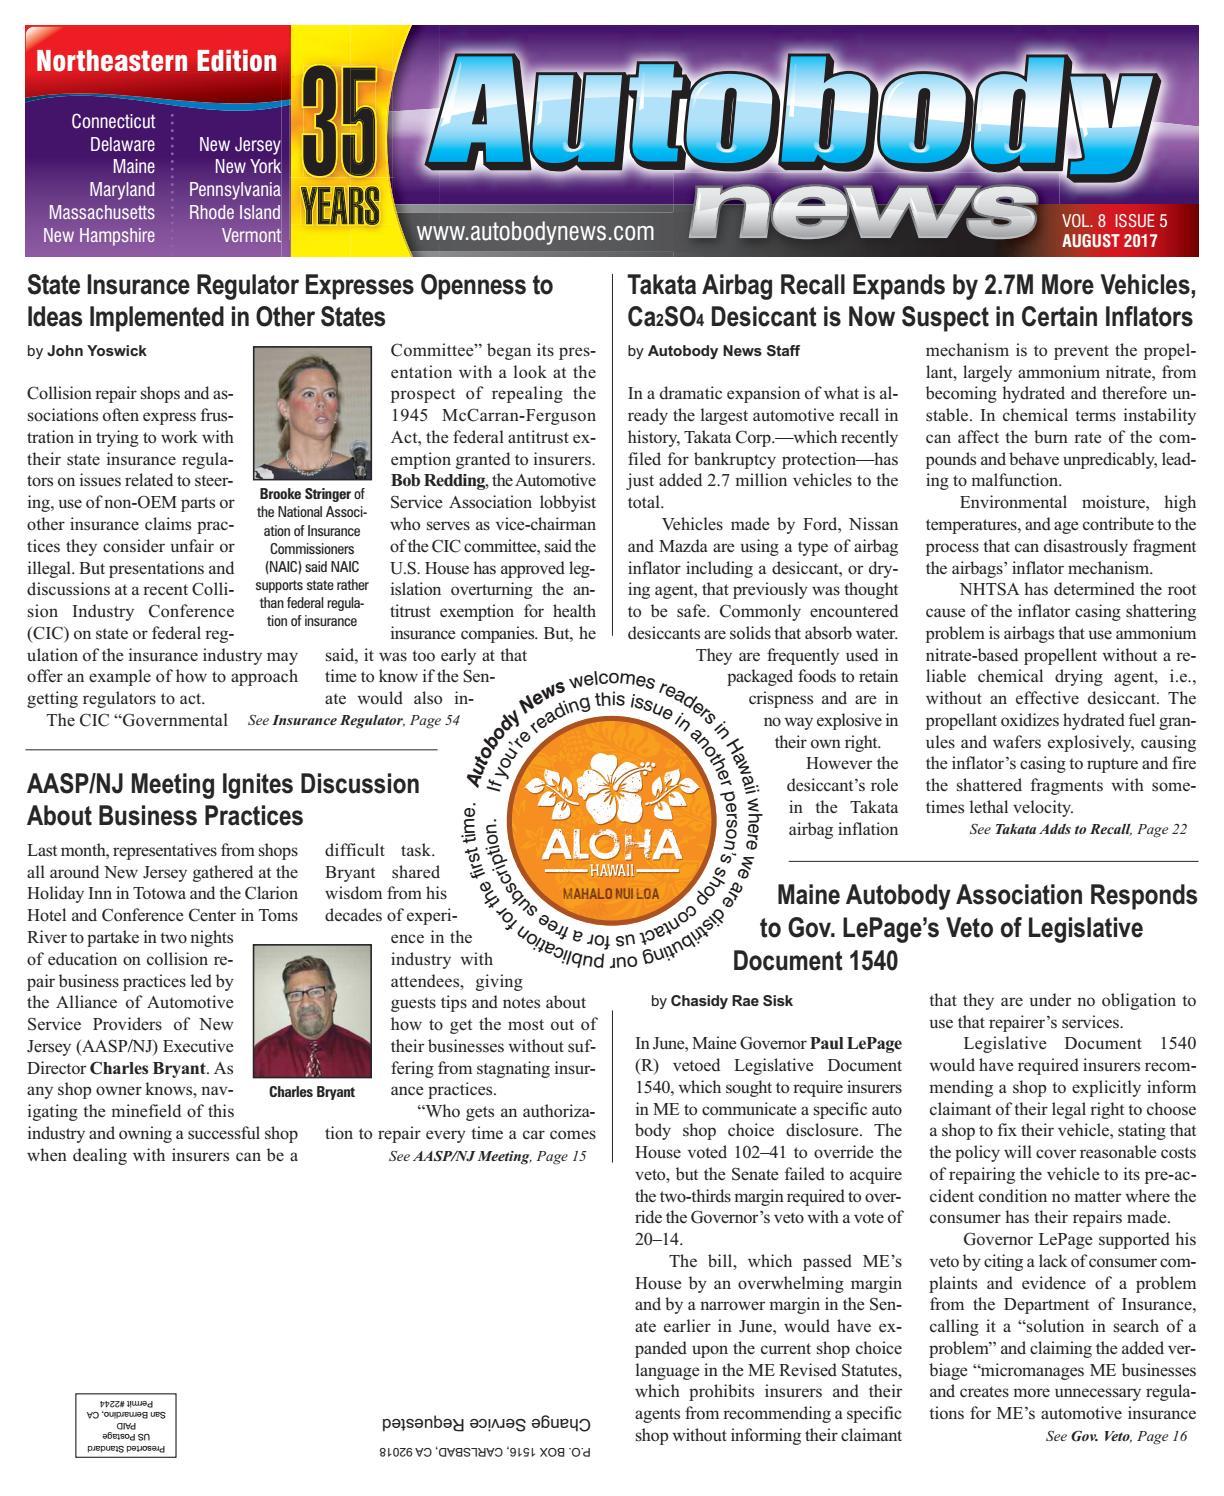 August 2017 Northeastern Edition by Autobody News - issuu